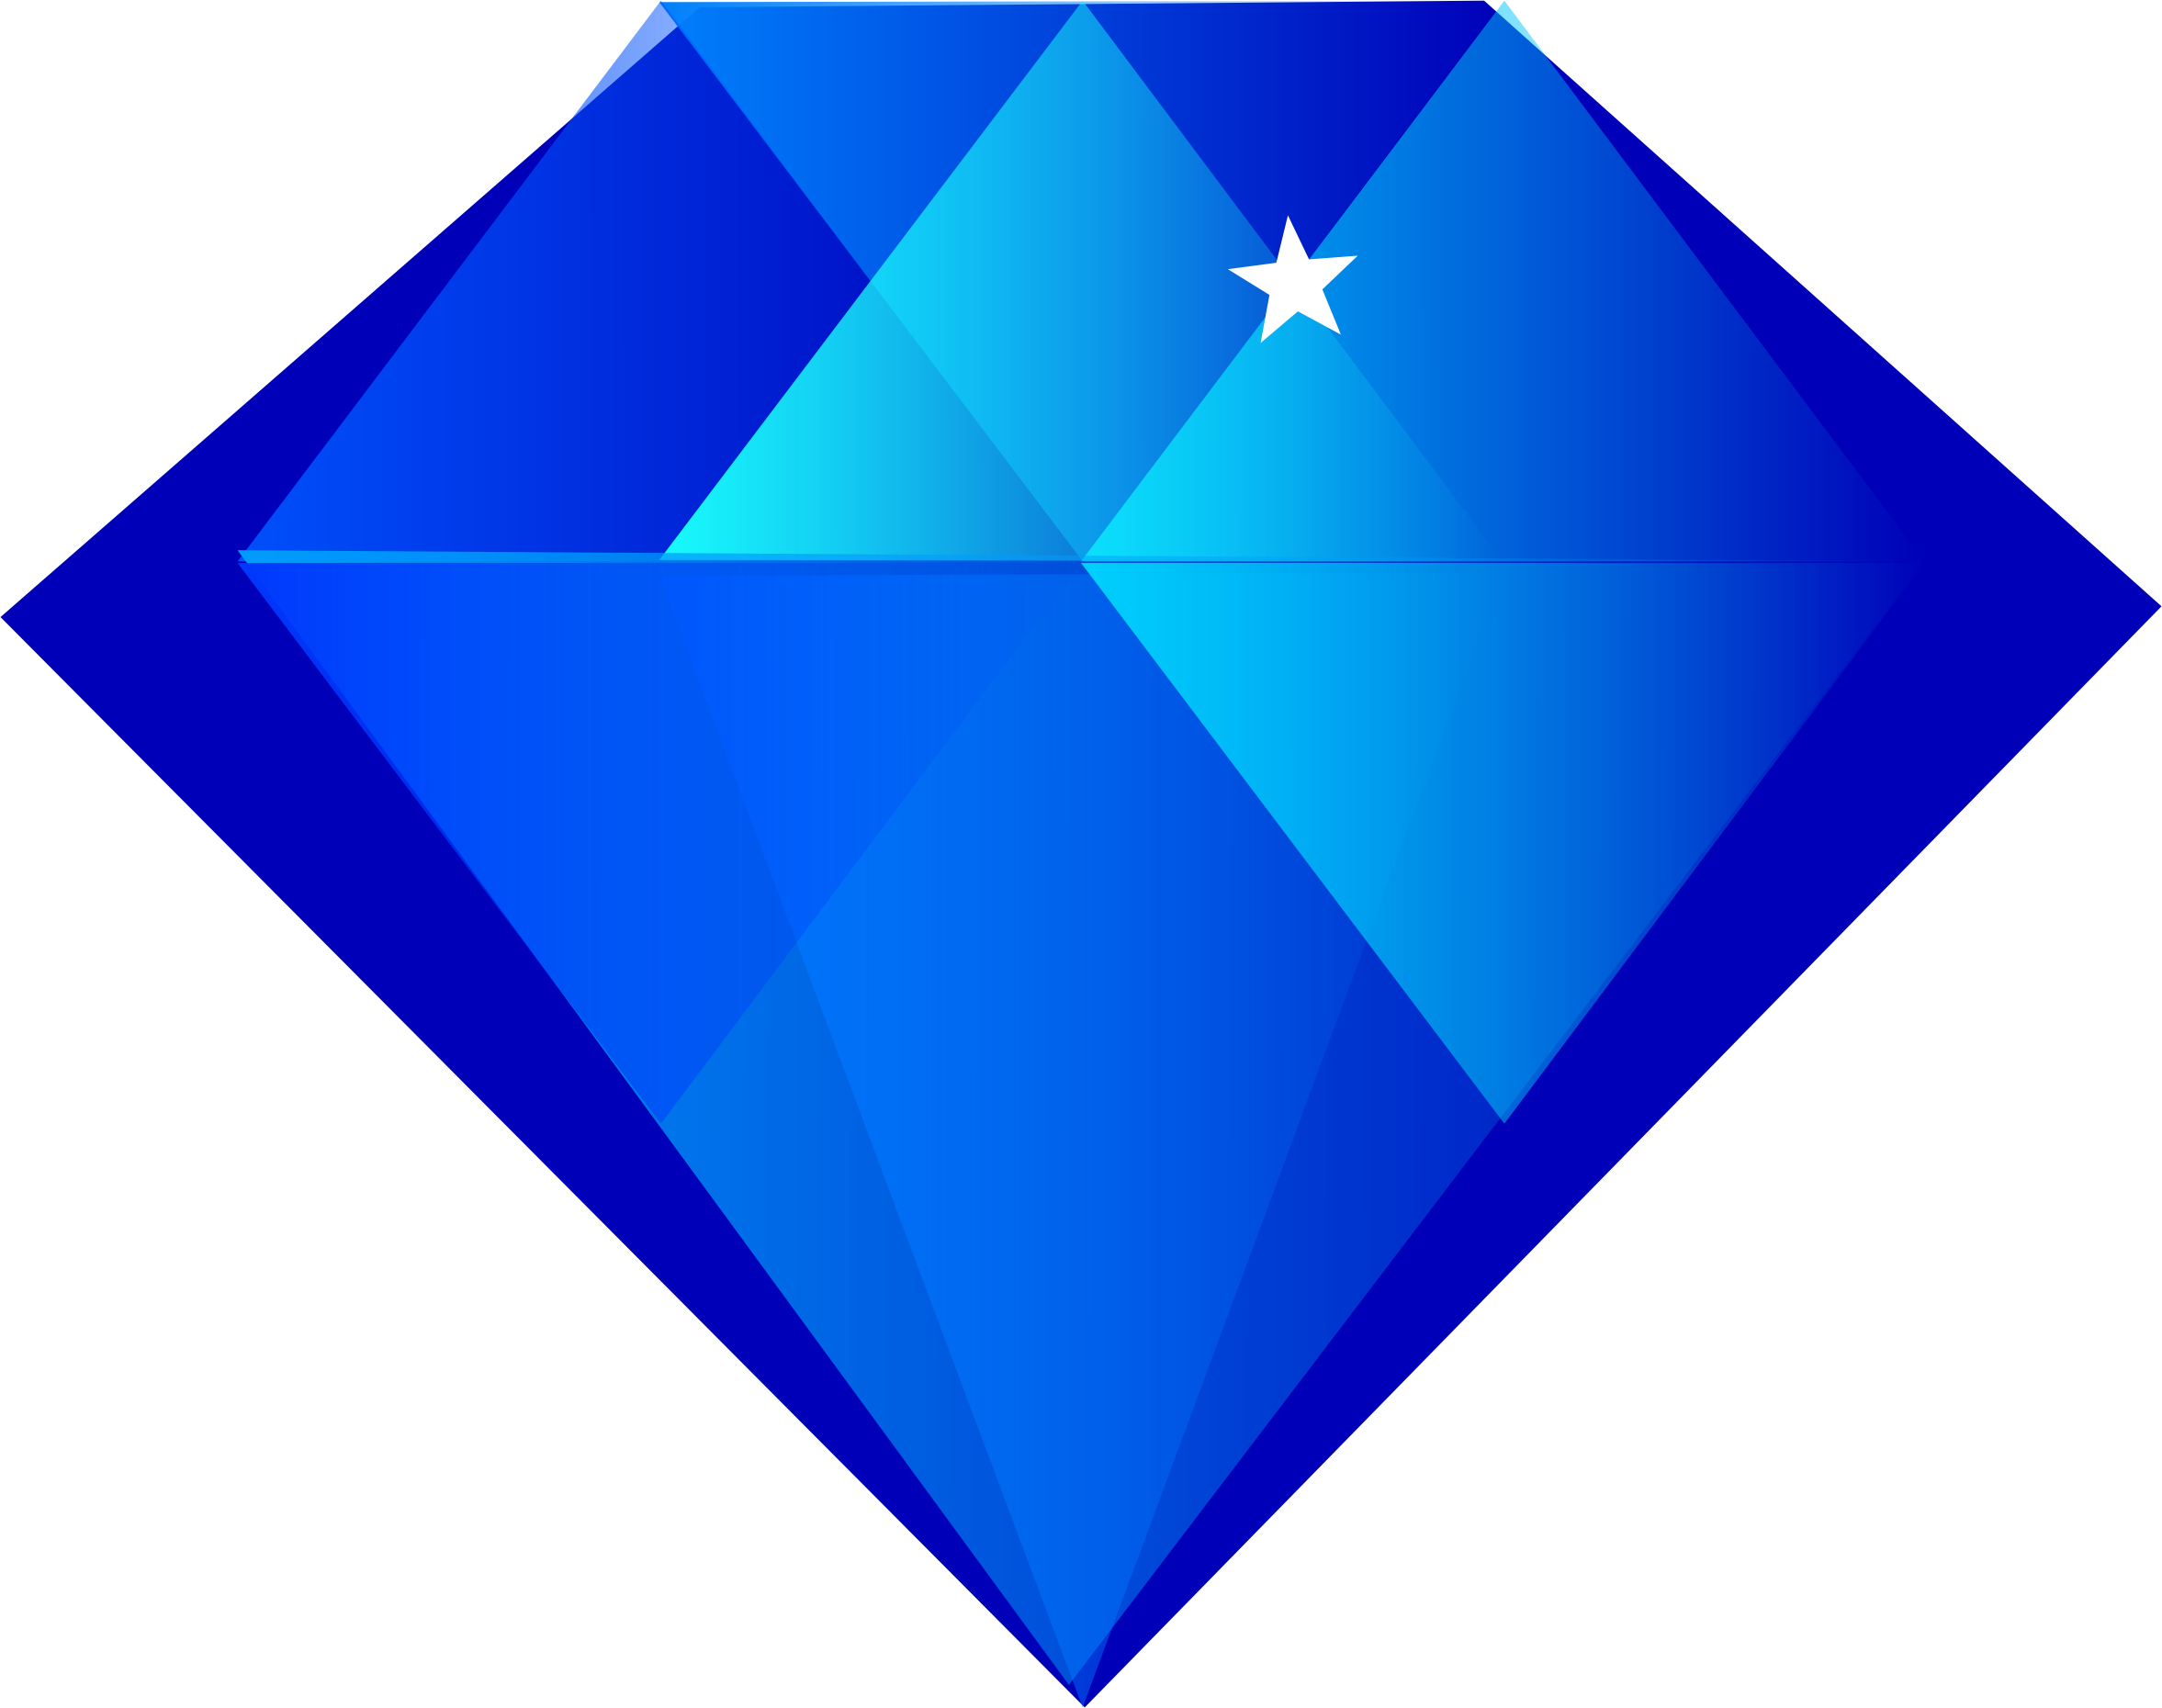 Blue big image png. Diamond clipart cartoon